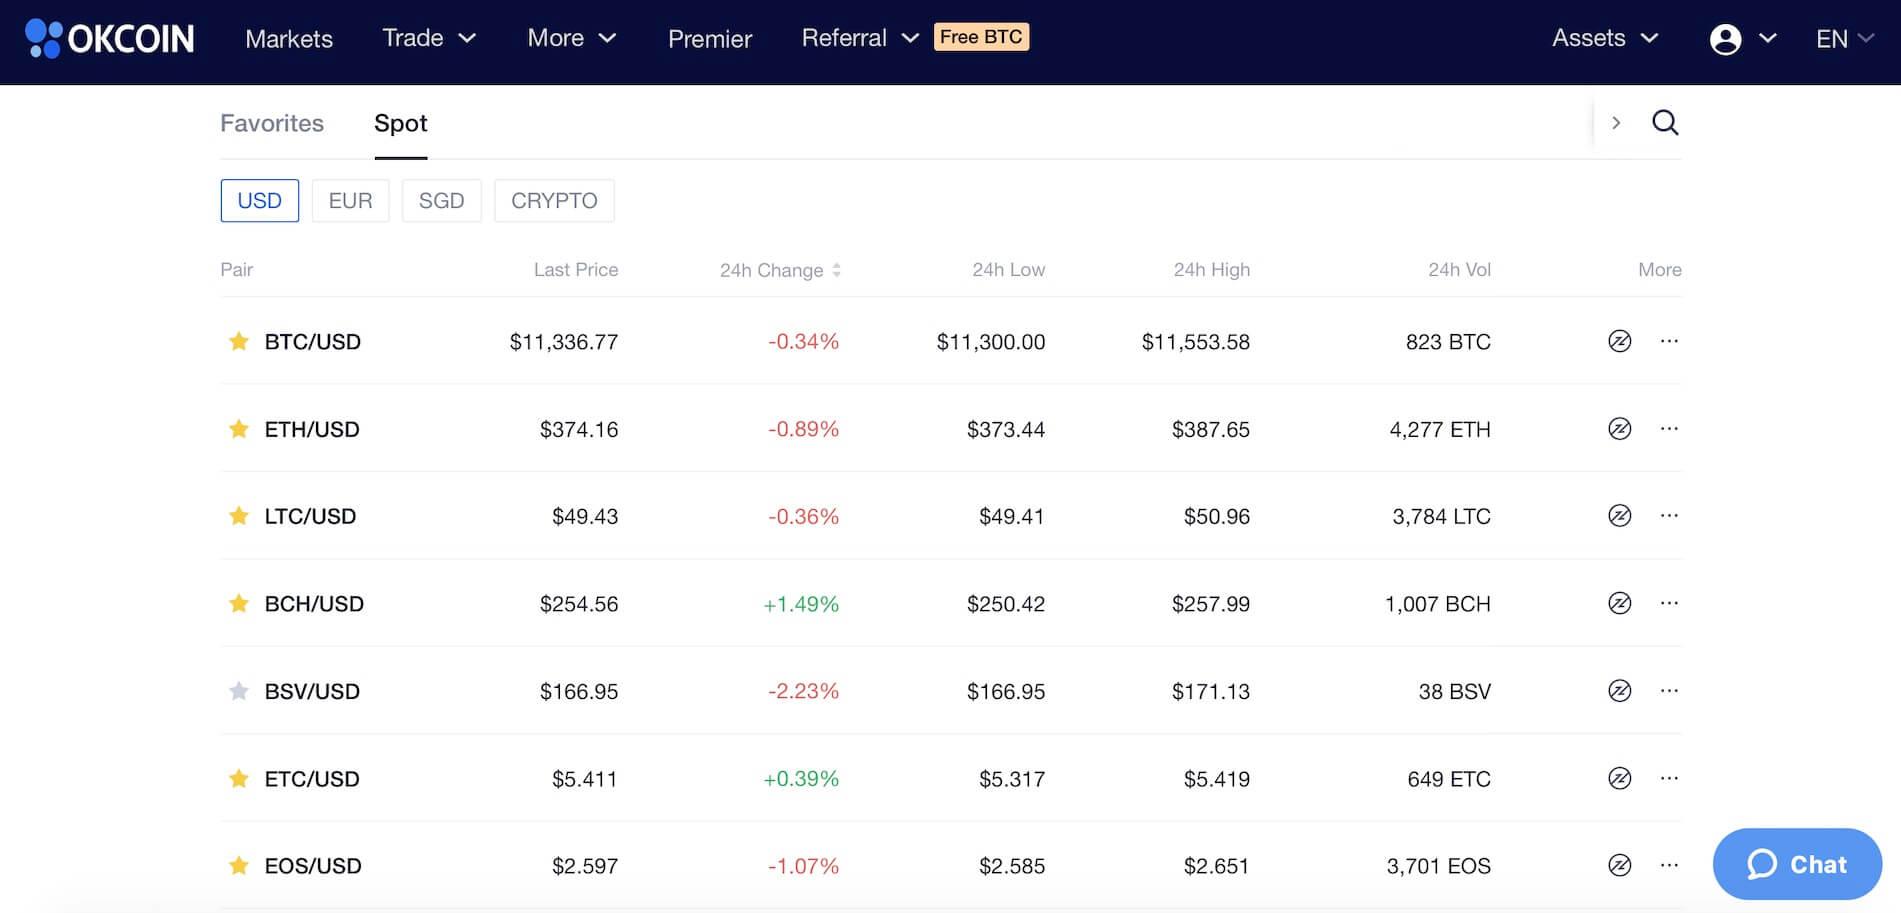 биржа криптовалют OKCoin